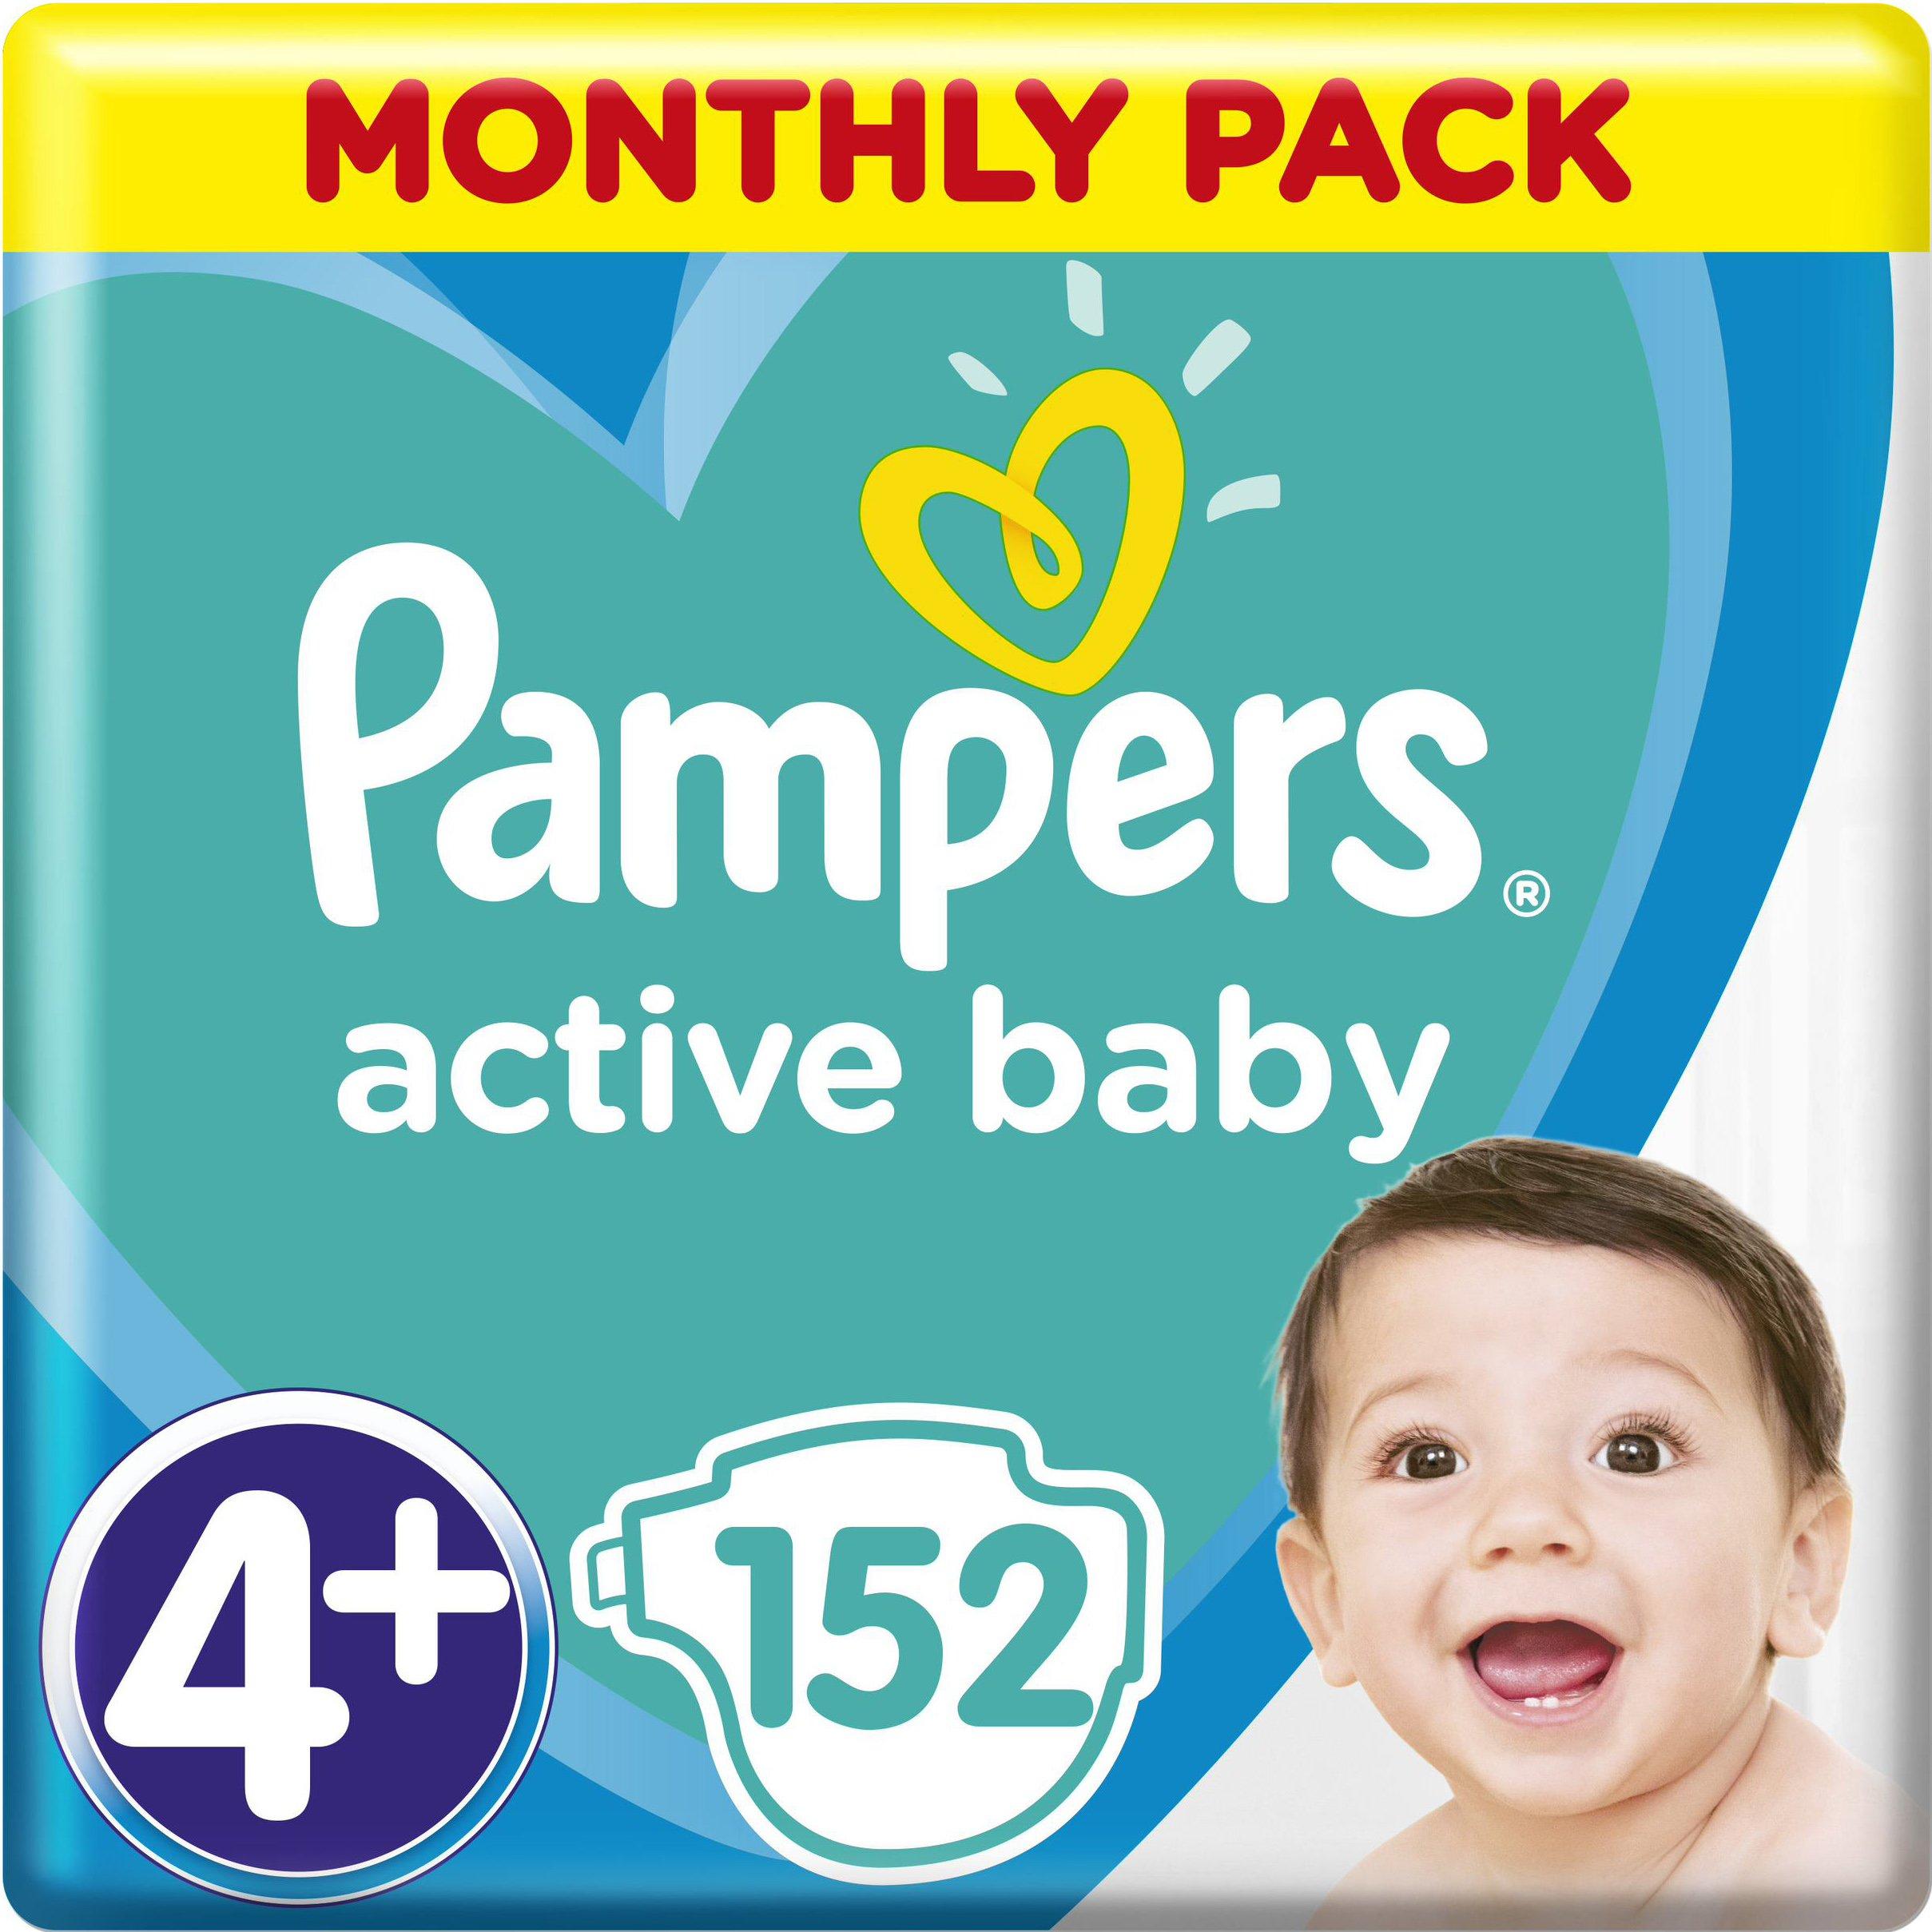 Pampers Active Baby Πάνες Monthly Pack No 4+ (10-15 kg), 152 Πάνες, μόνο 0,26€ / μητέρα παιδί   περιποίηση για το μωρό   πάνες για το μωρό